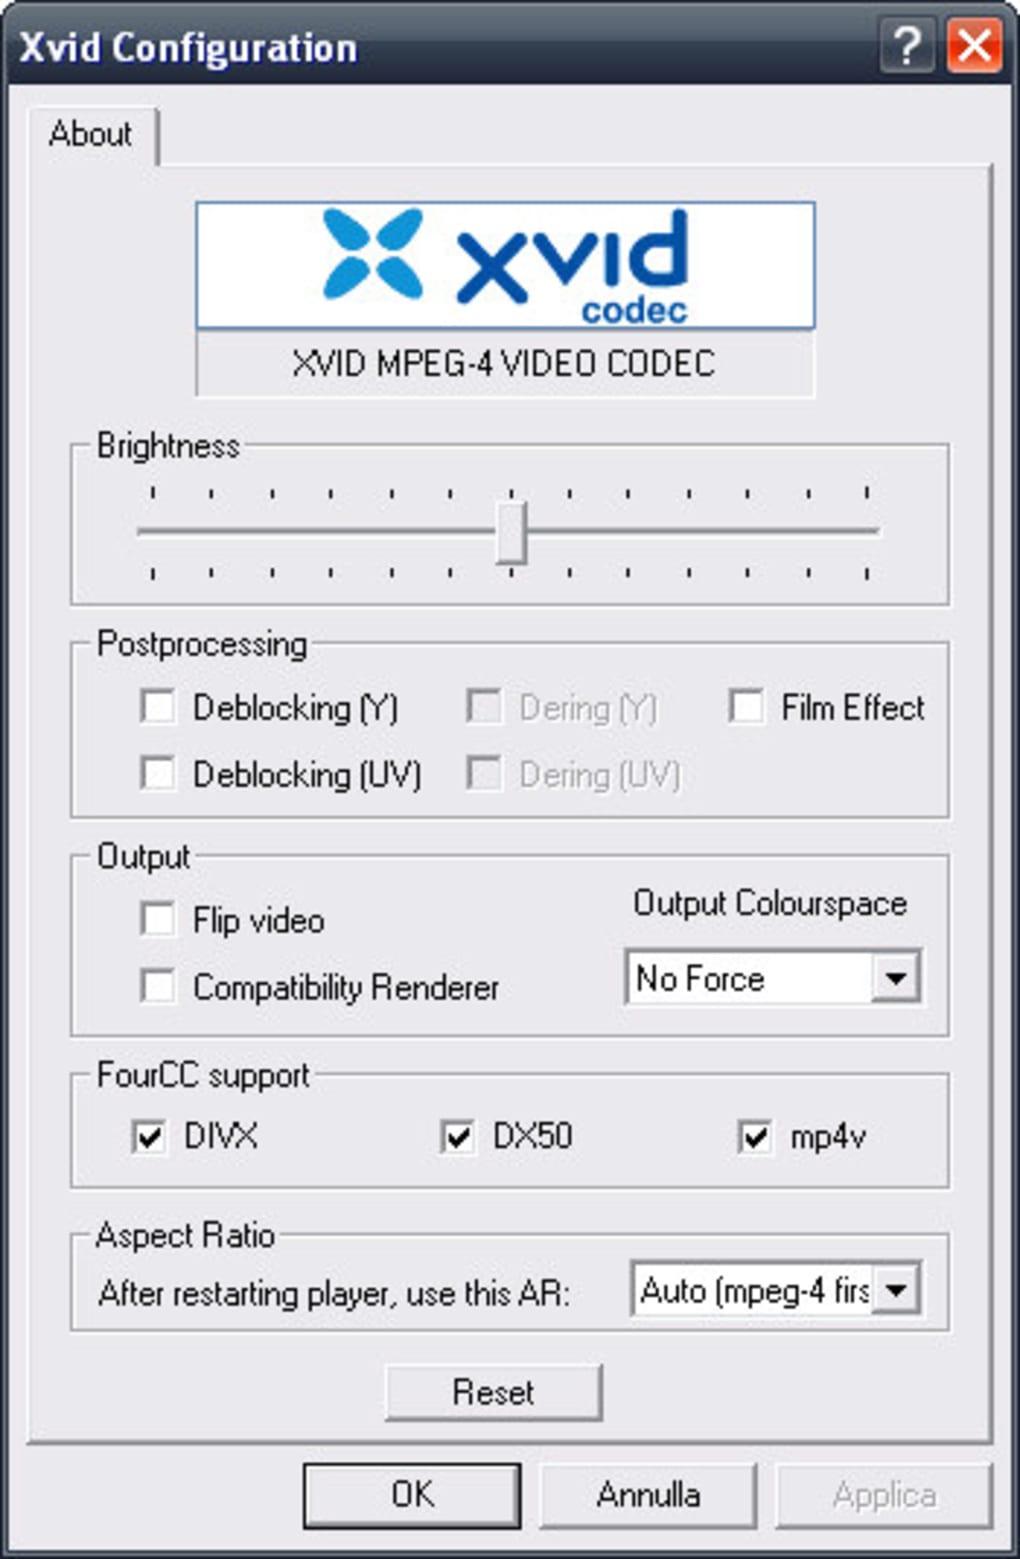 divx mpeg-4 dx50 codec